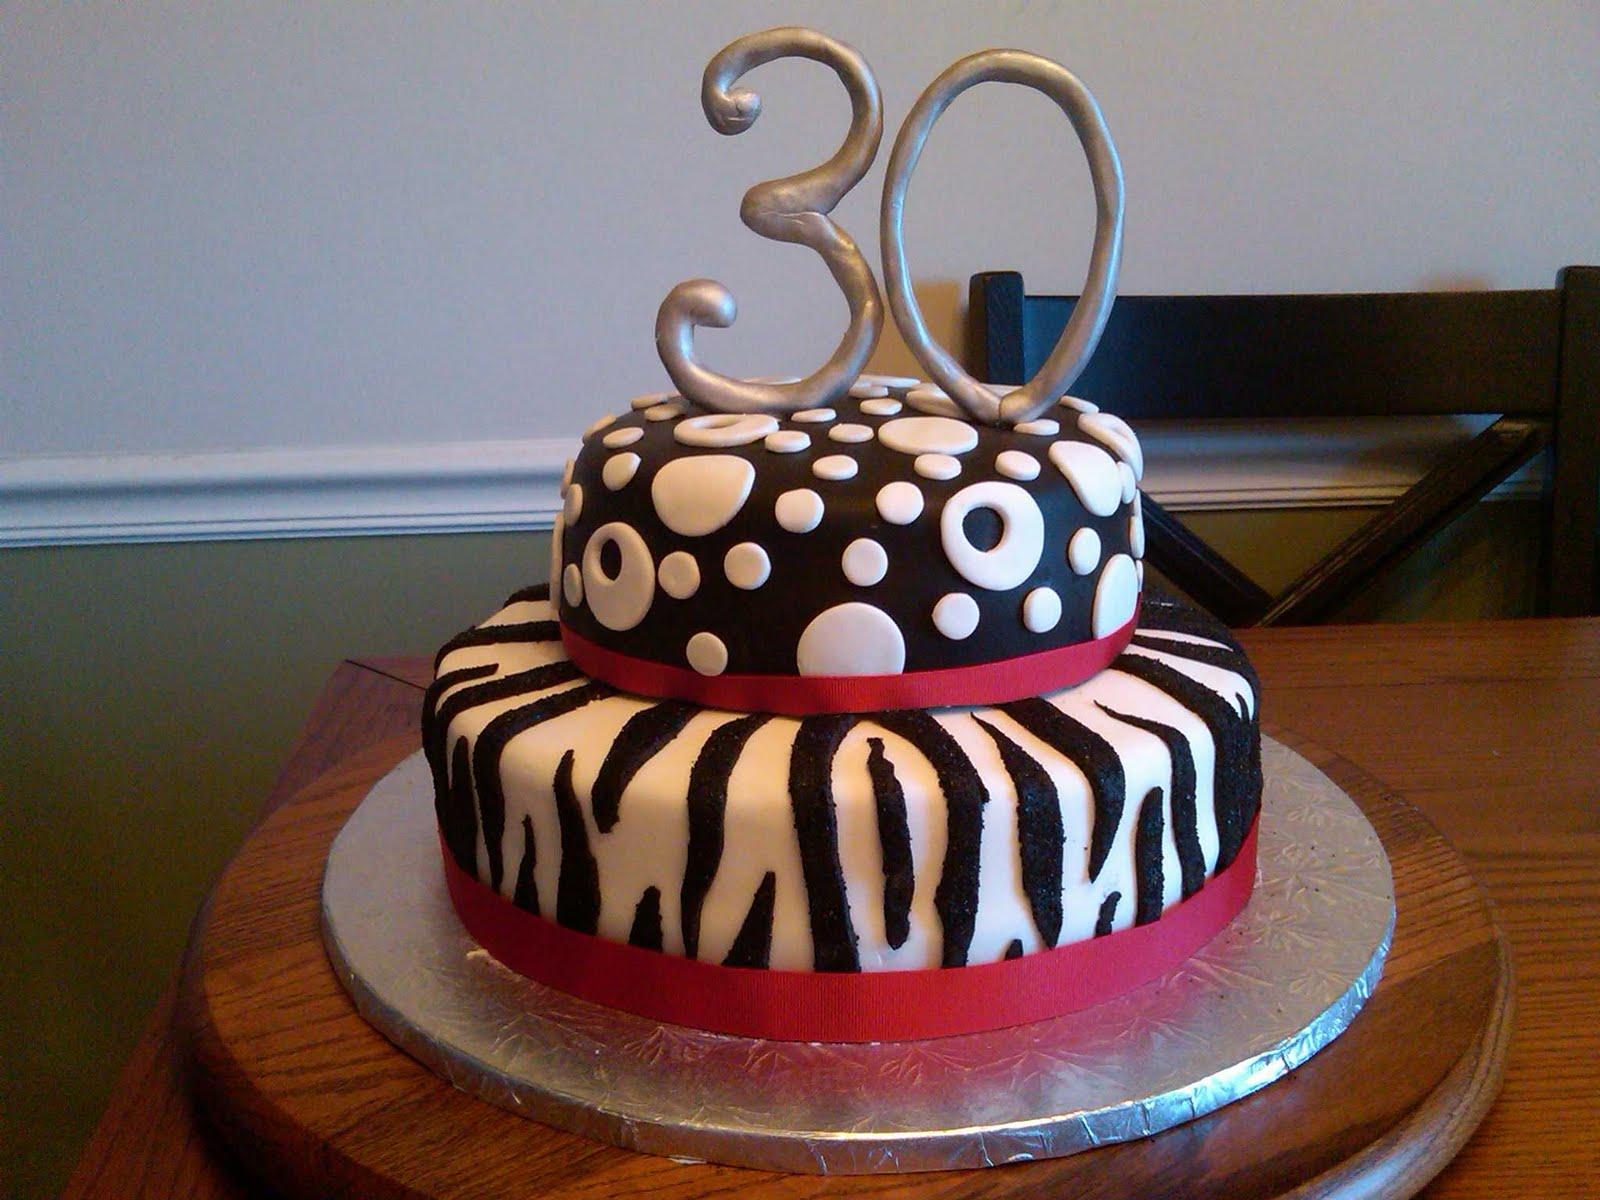 30th Birthday Decorating Ideas